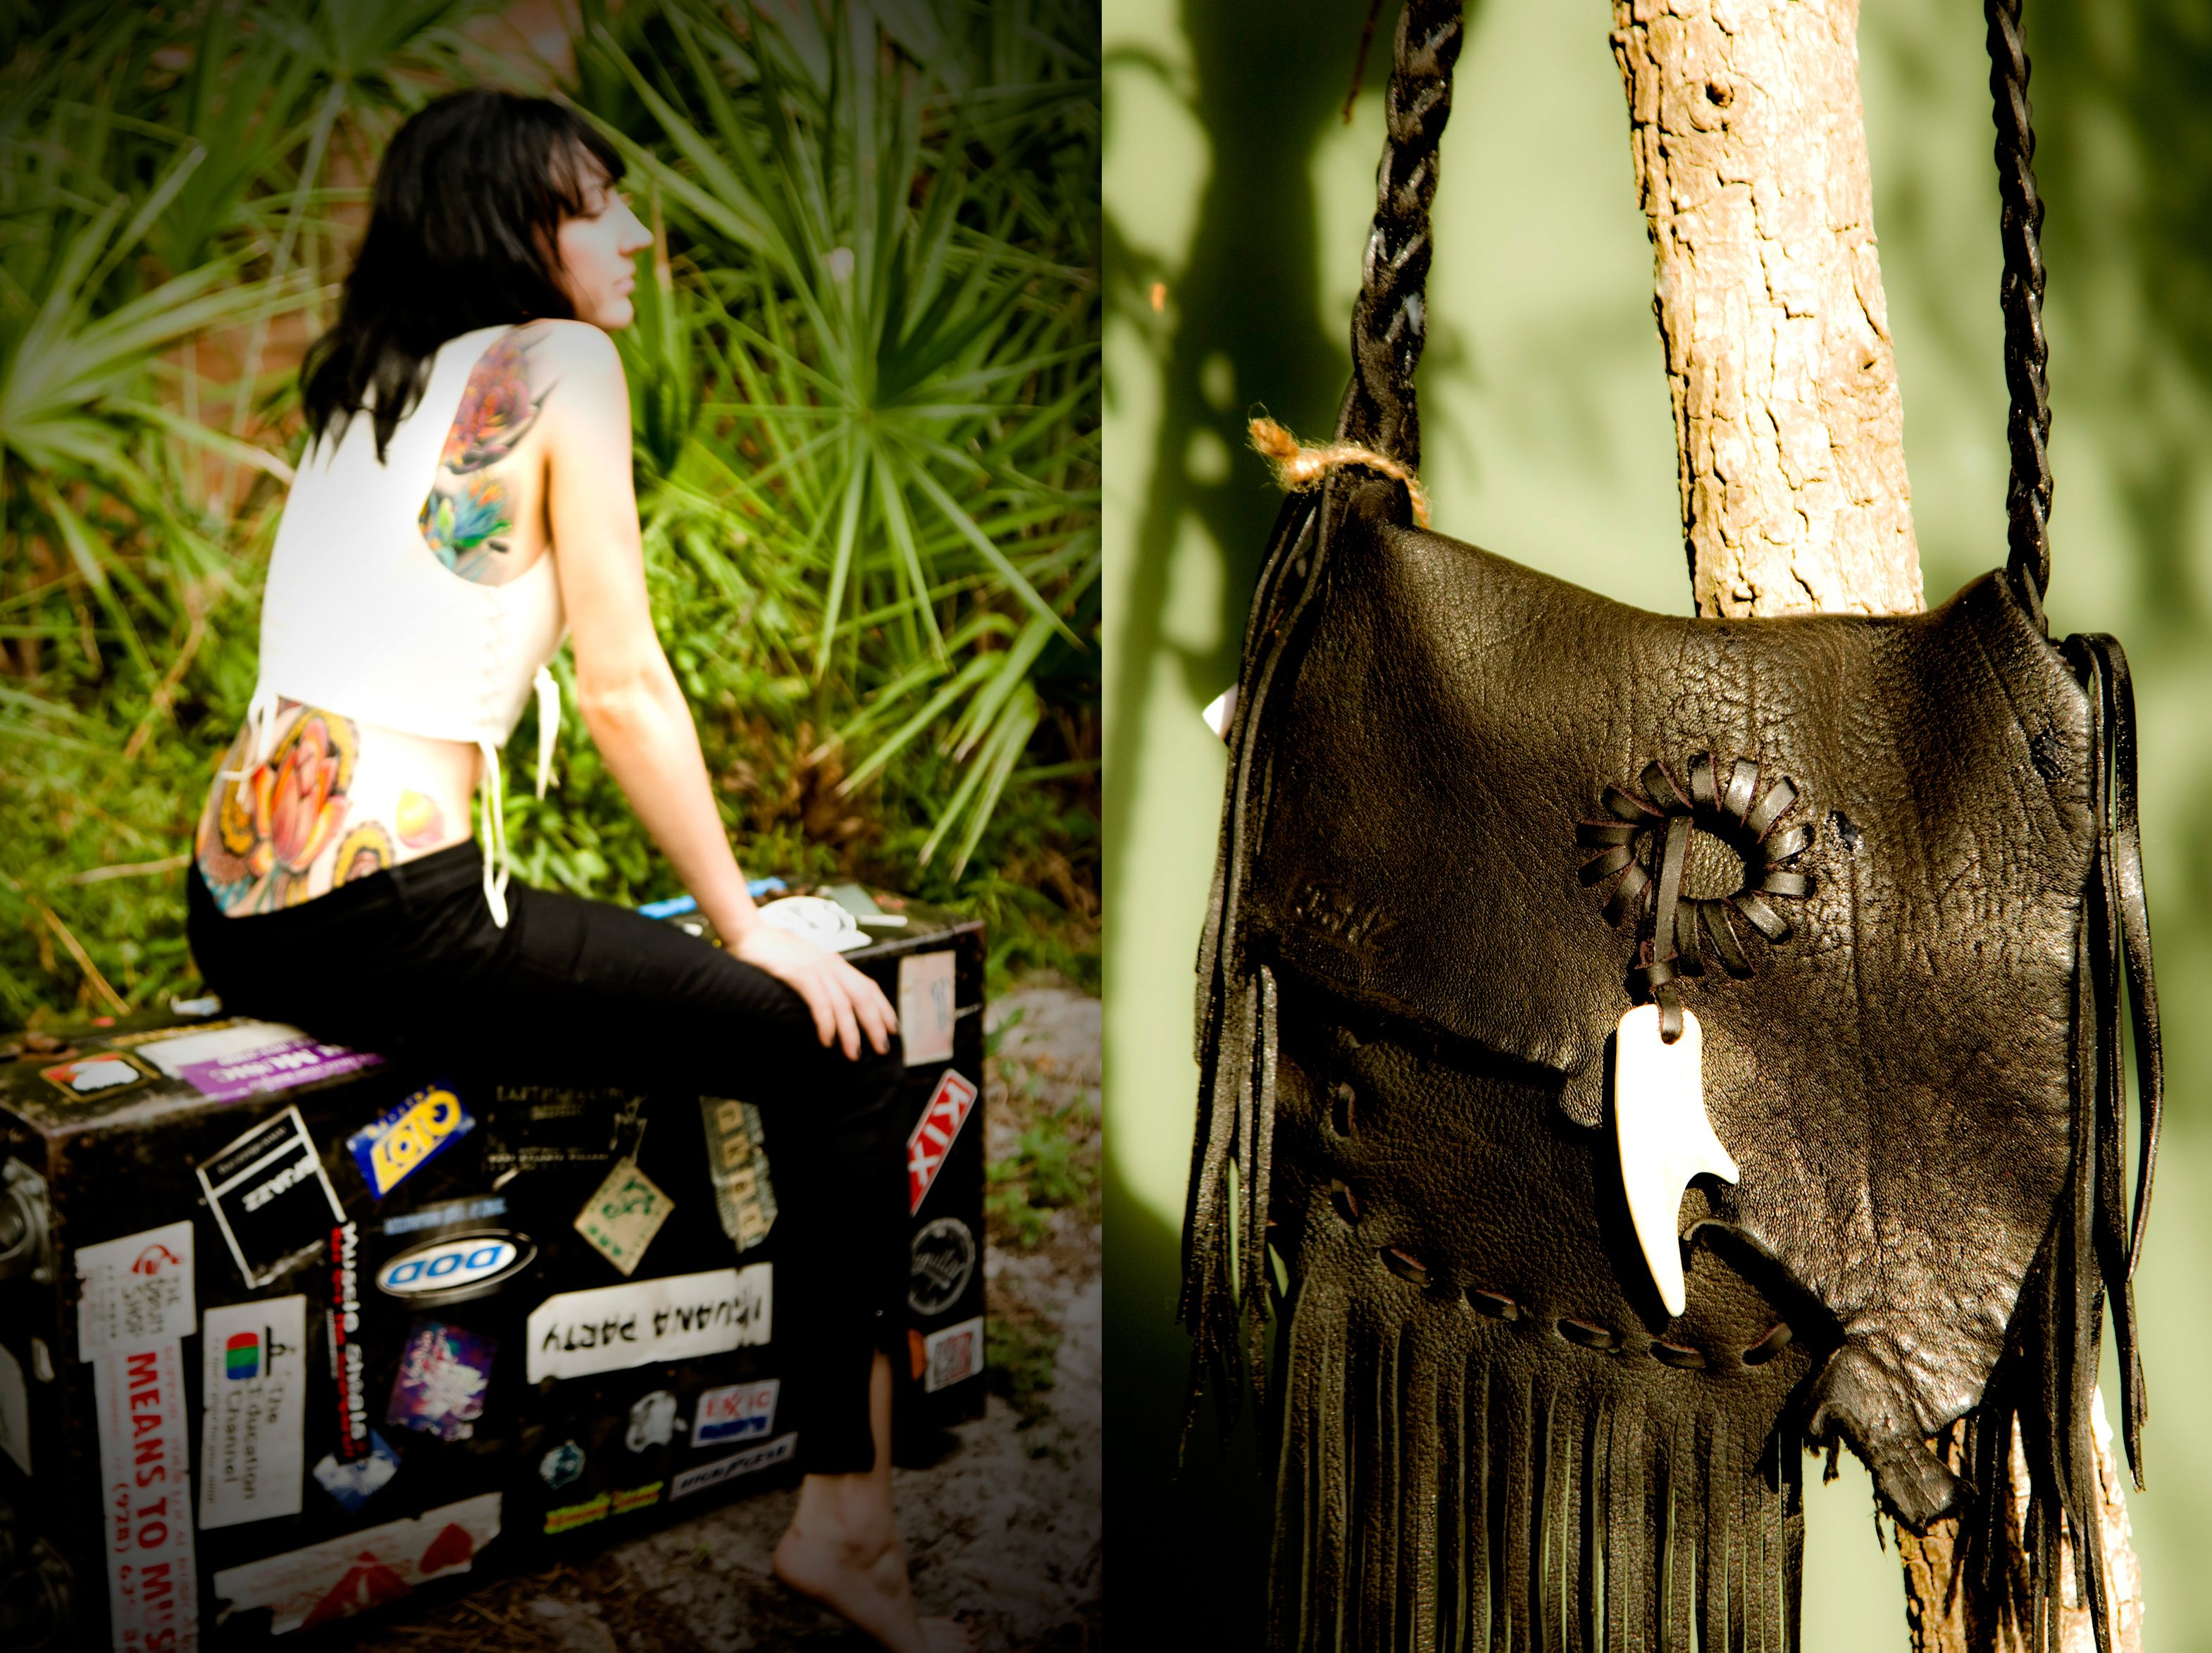 Jimmi Wz Hand Wrought Bags Available At La Vie Est Belle